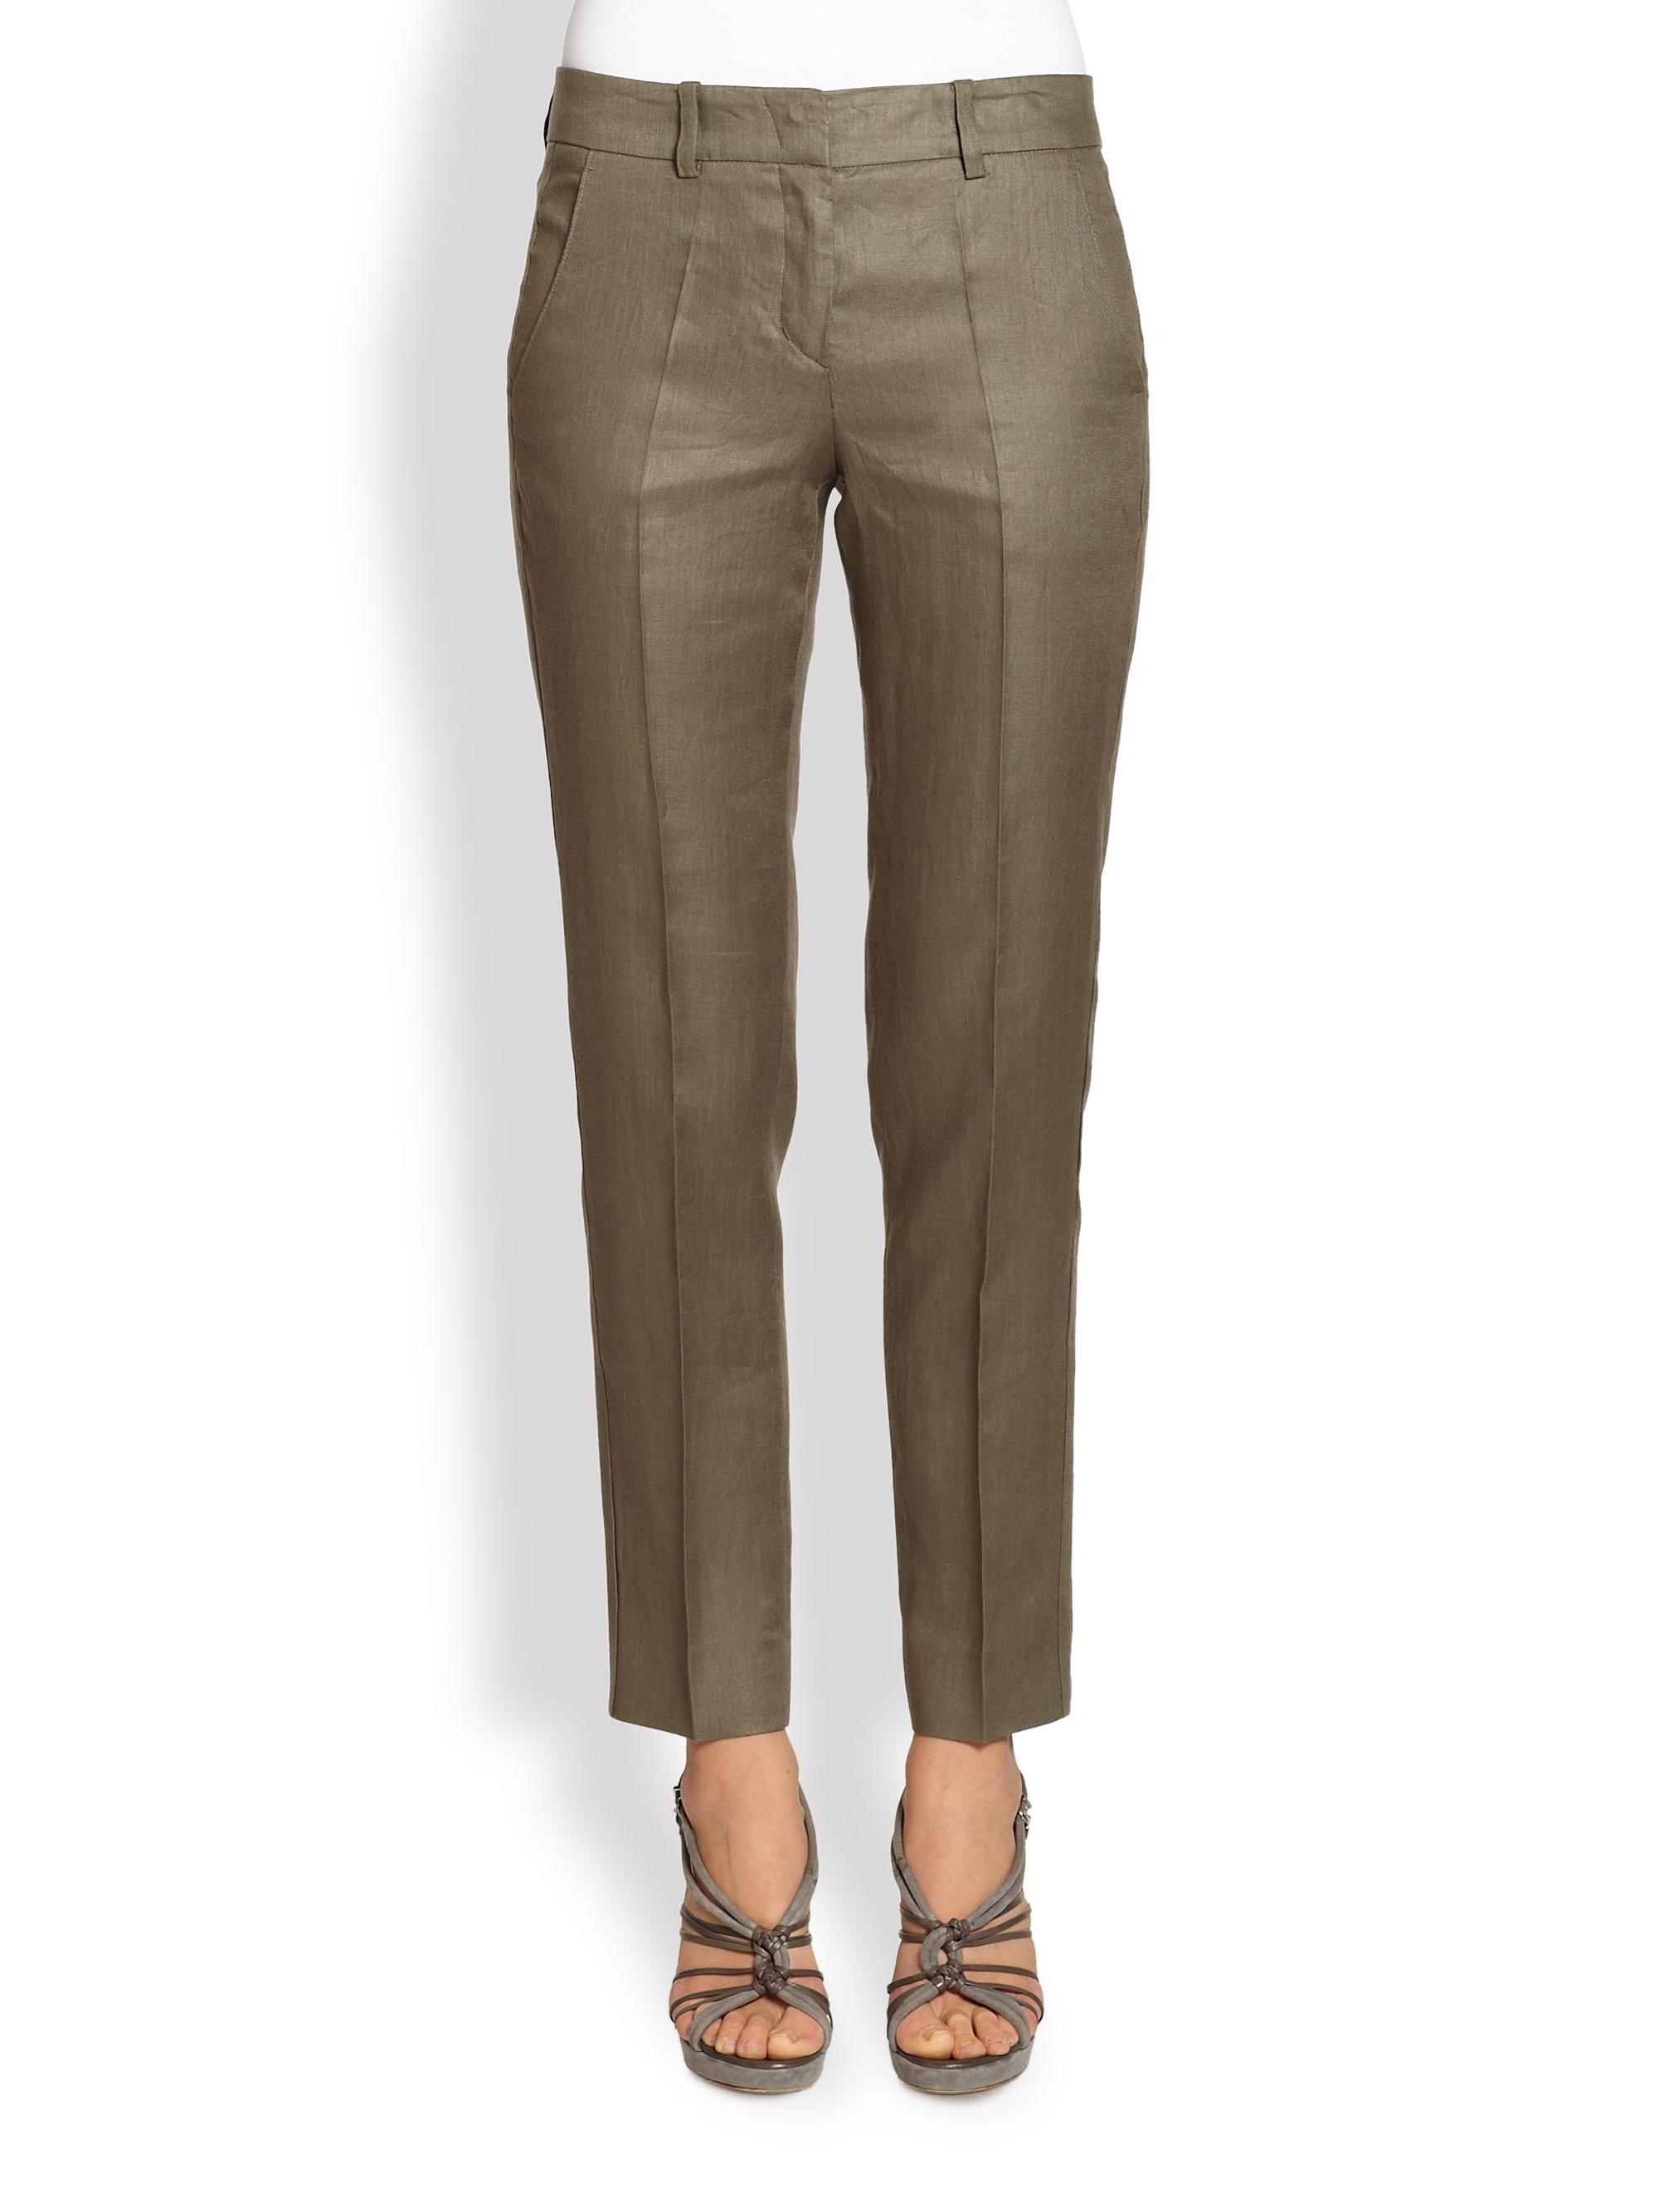 Armani Slim Linen Pants in Natural | Lyst